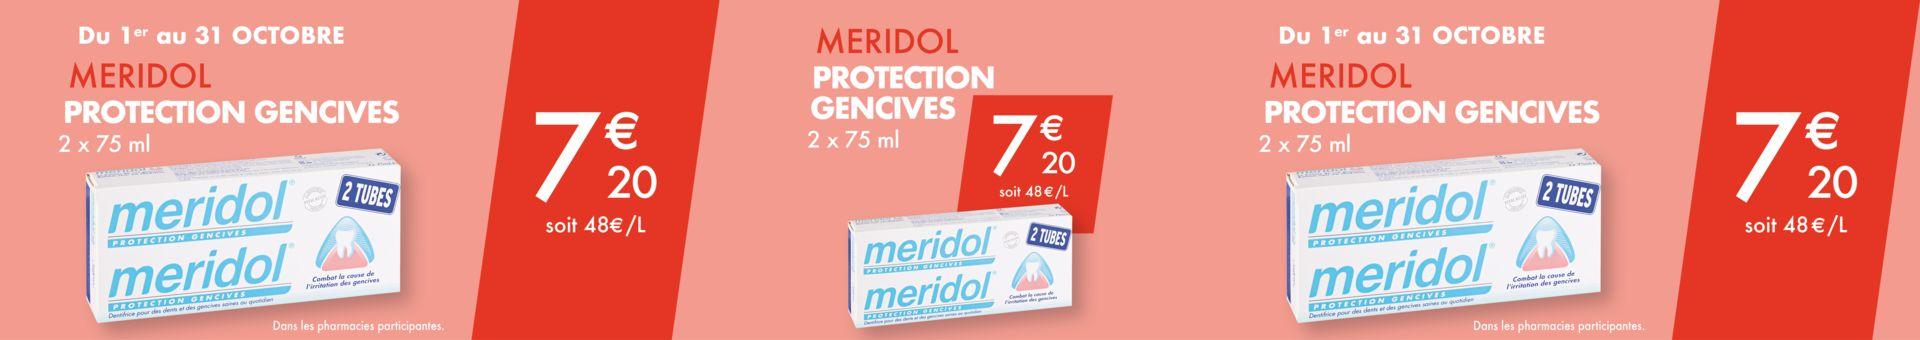 Pharmacie Crosetto,Paray-le-Monial